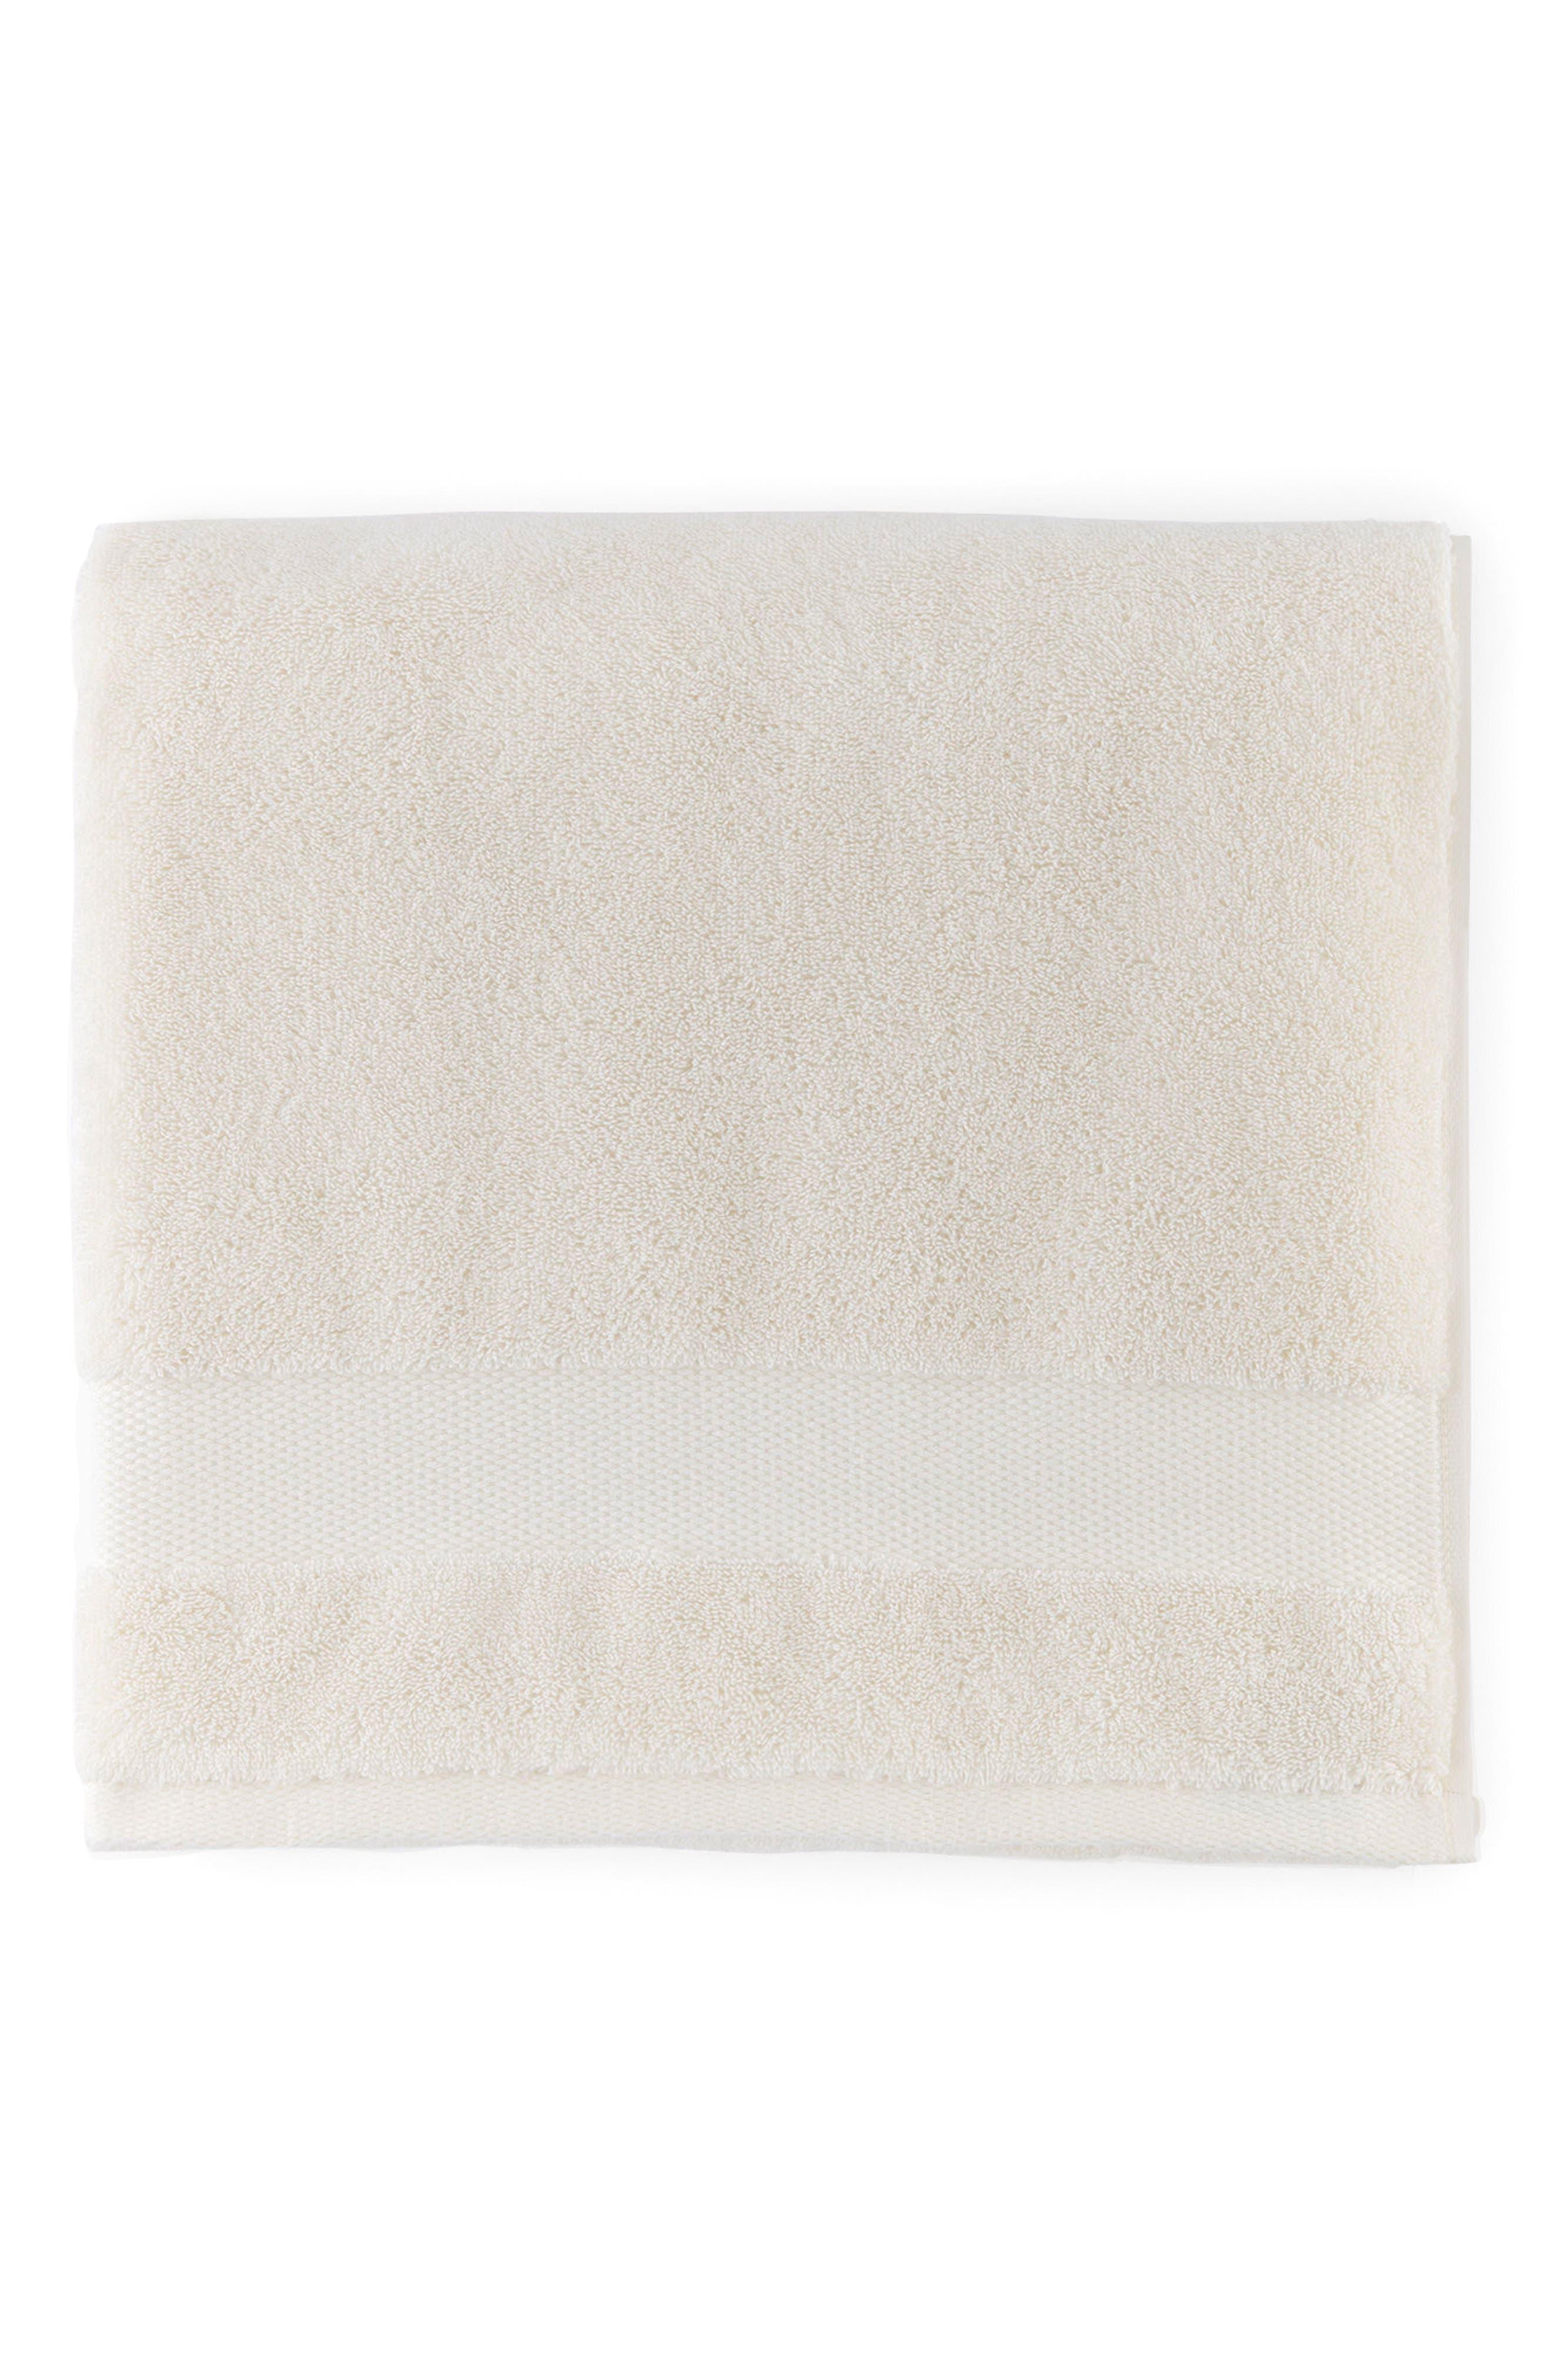 Bello Tip Towel,                             Main thumbnail 1, color,                             Ivory